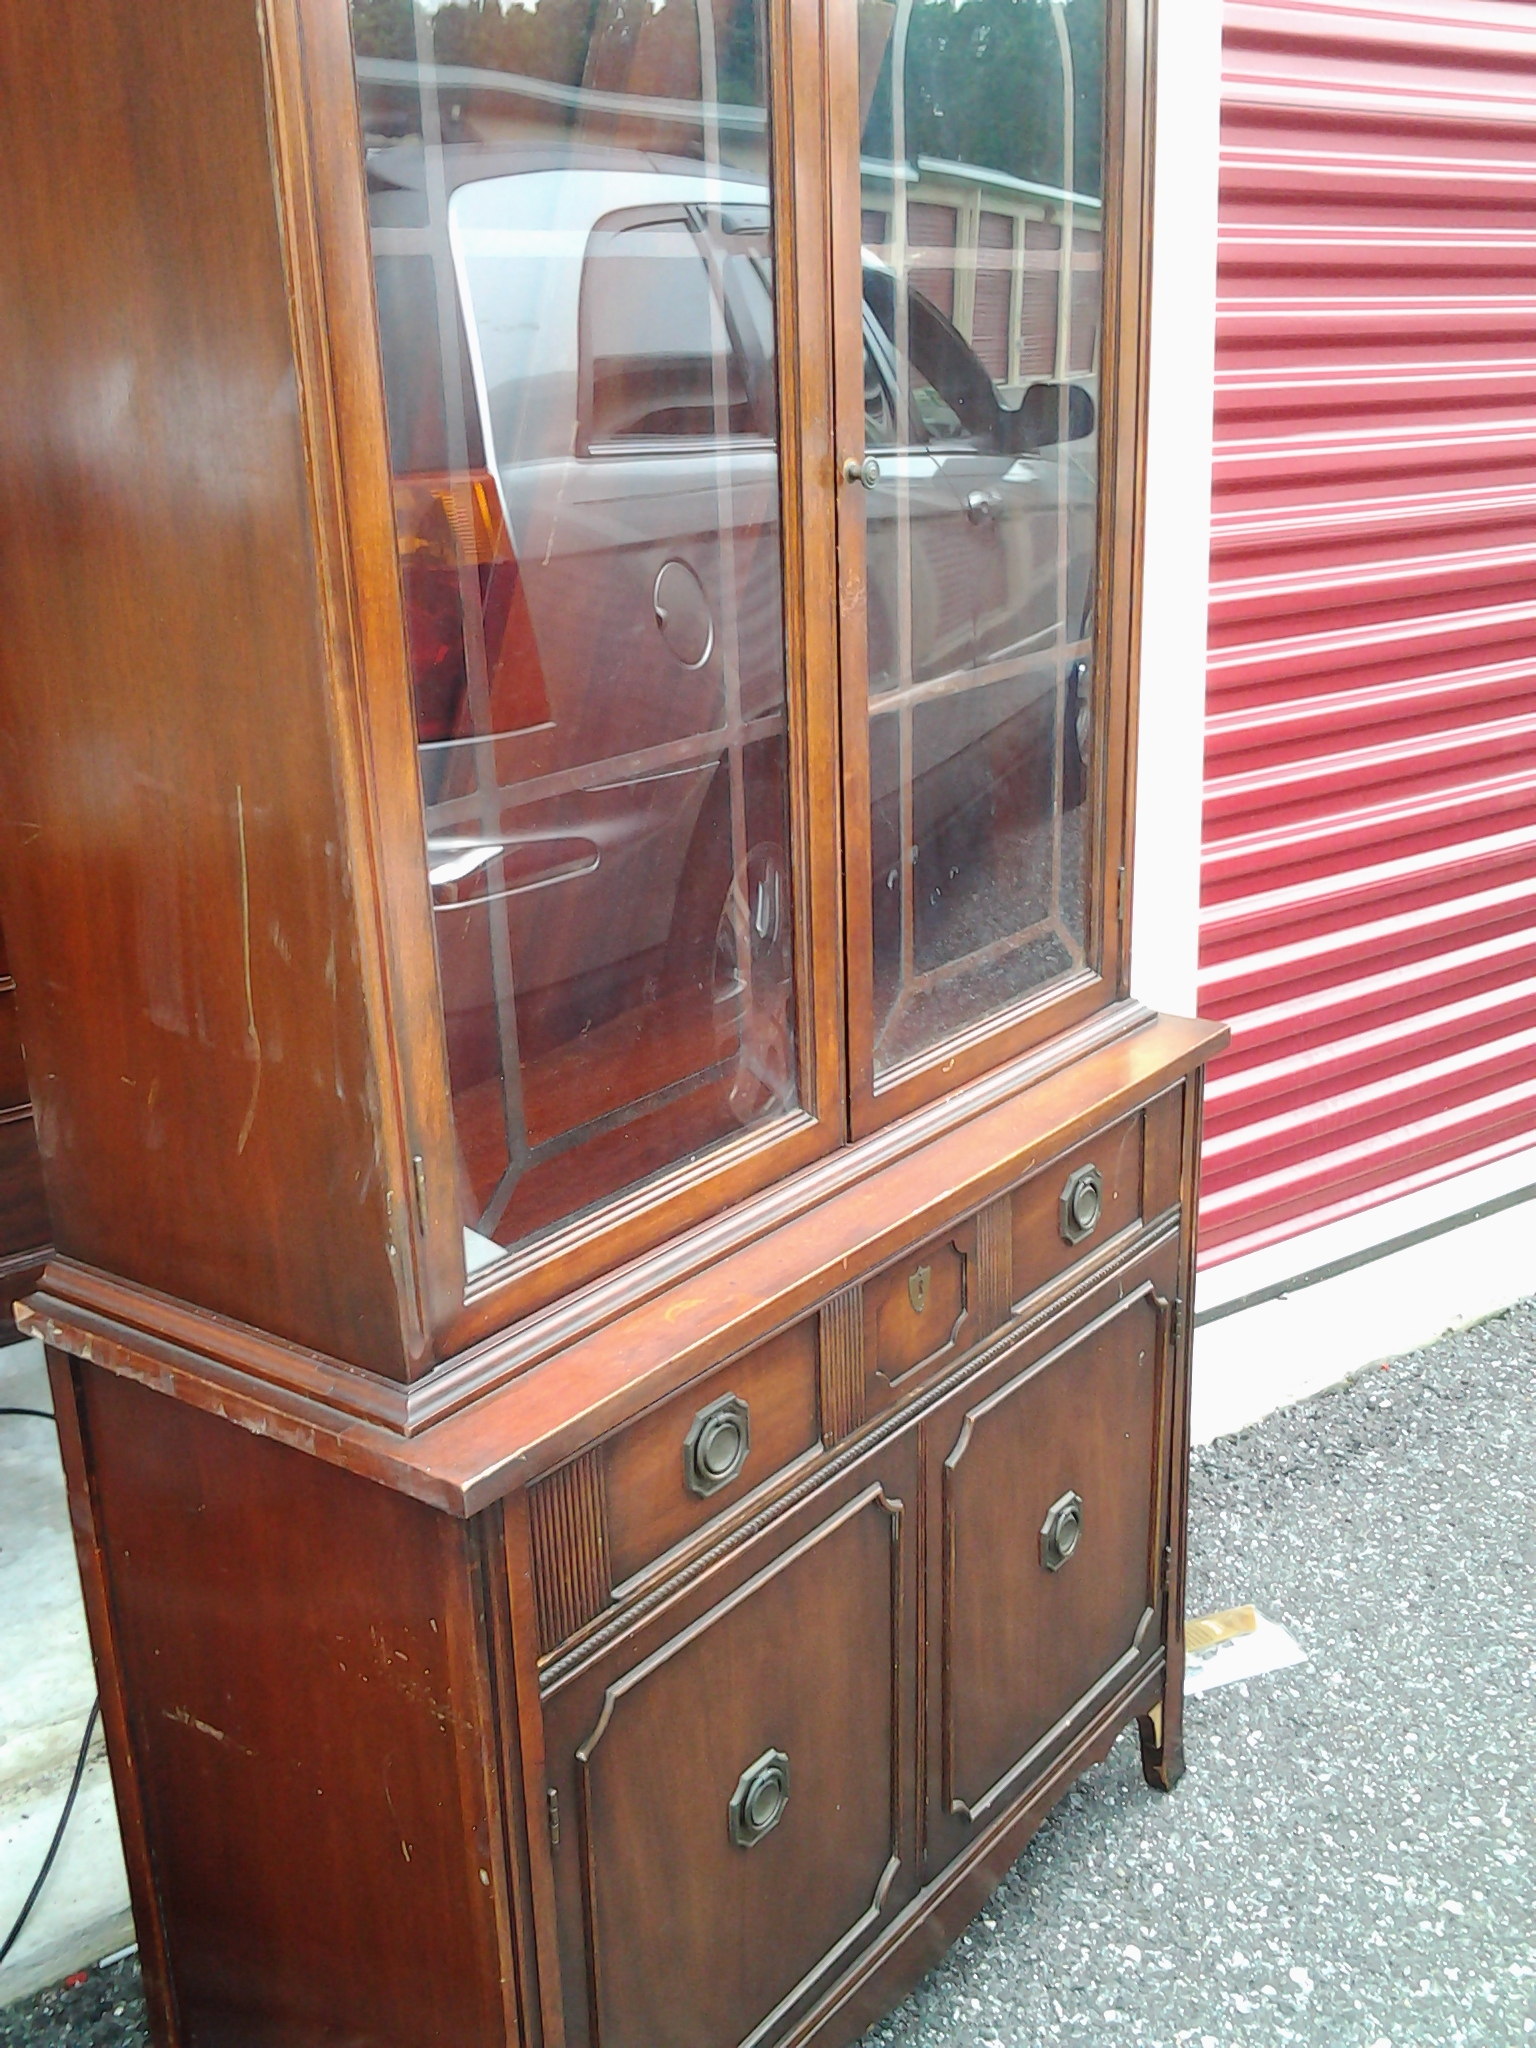 Bernhardt Antique Hutch And Sideboard Buffet Mahogany Antique Appraisal Instappraisal